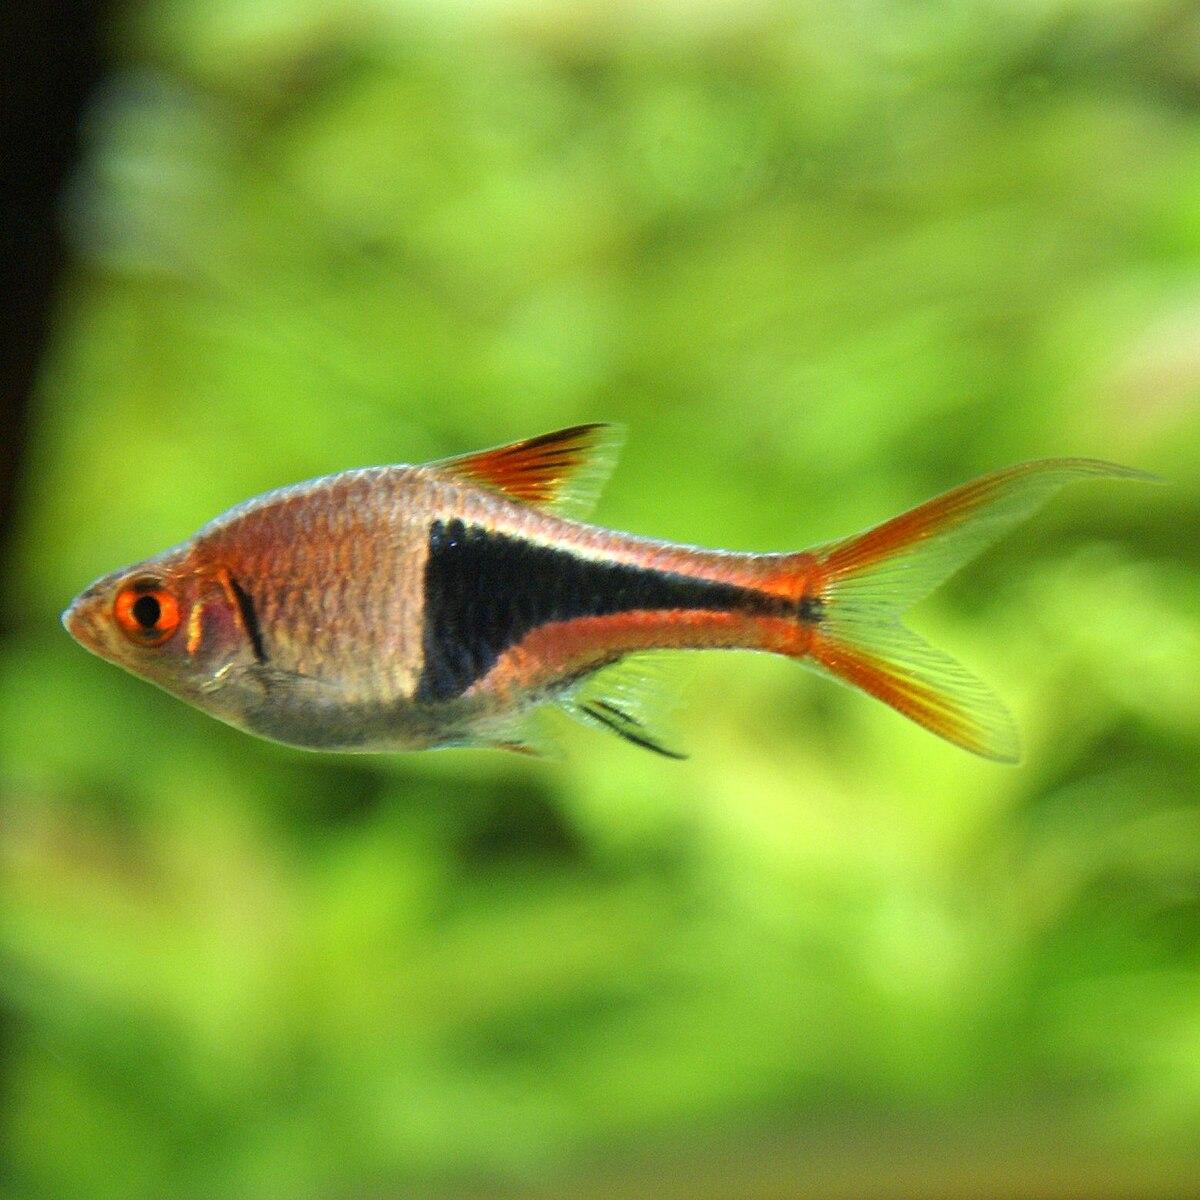 Trigonostigma heteromorpha wikipedia for Aquarium a poisson